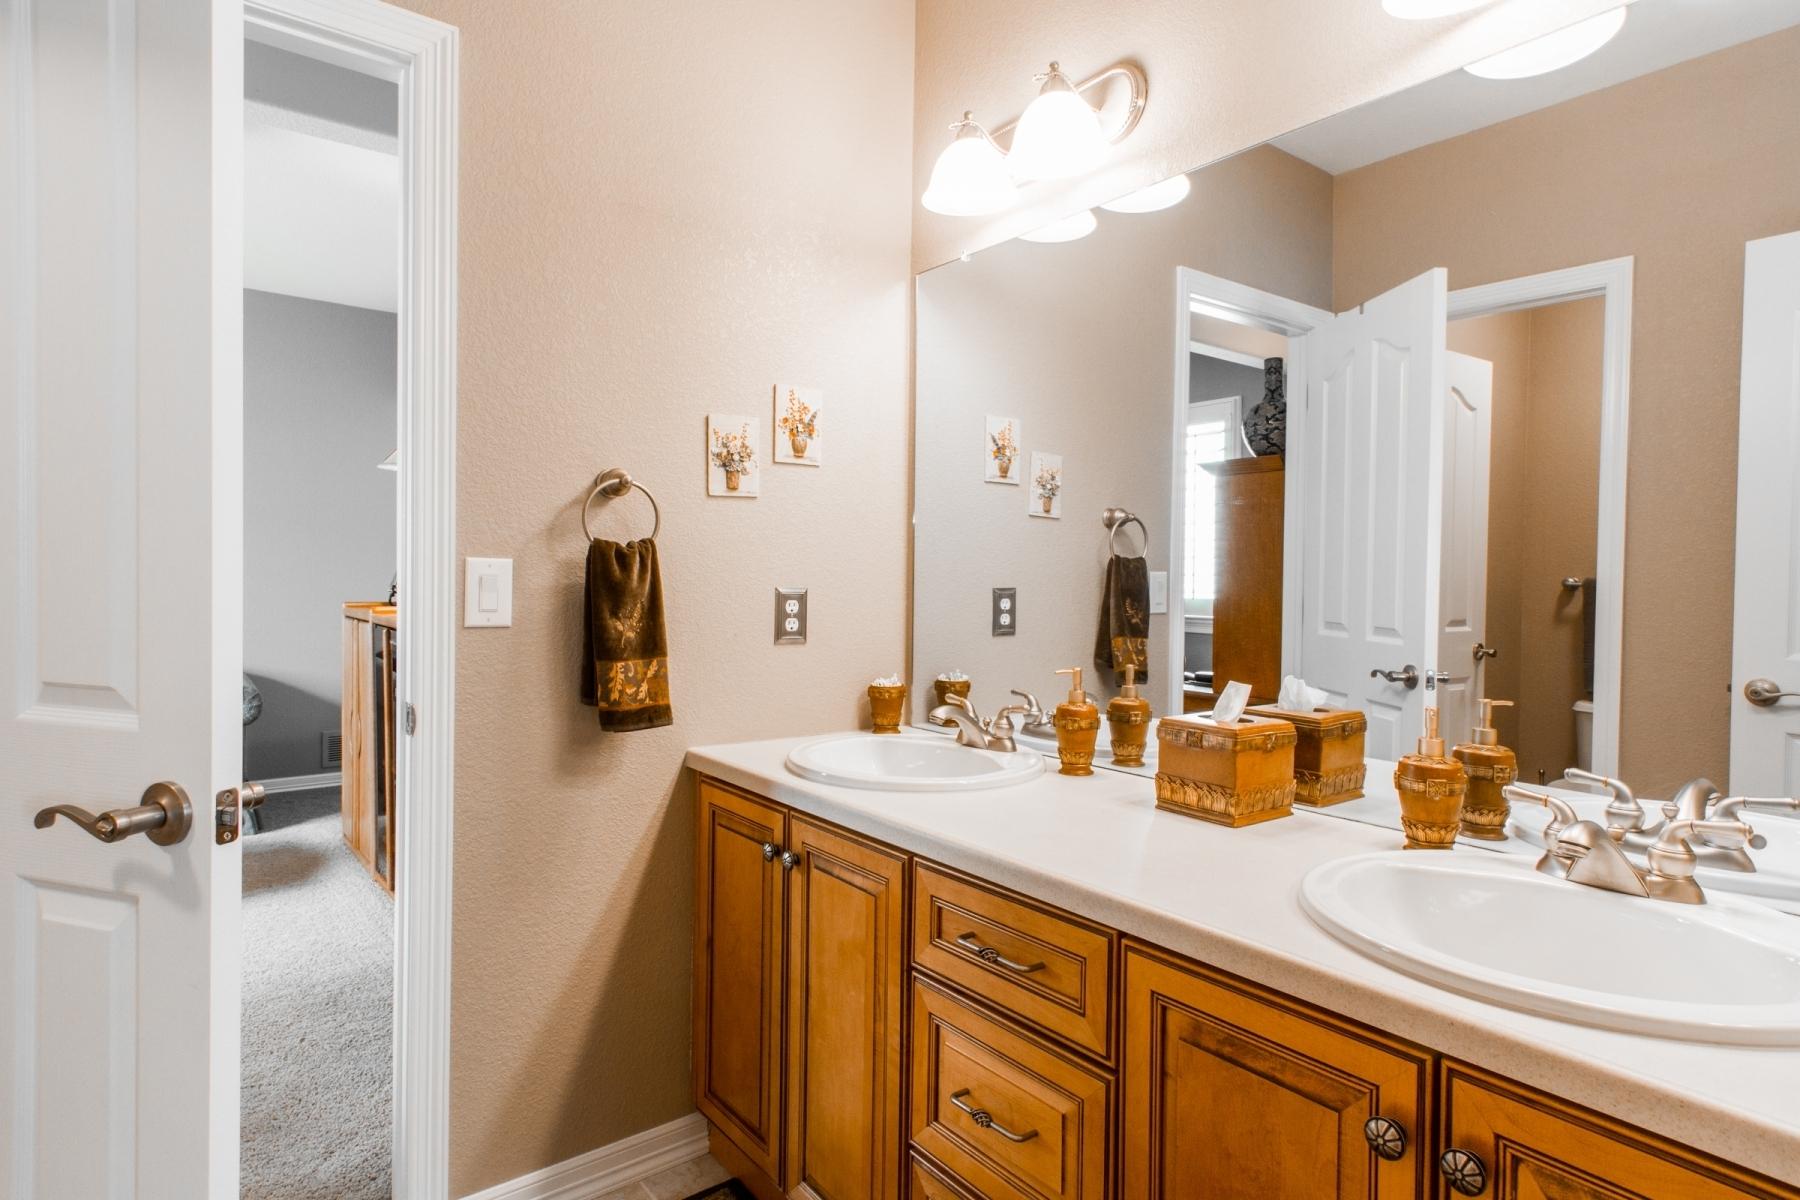 Bathroom_1800x1200_2768896.jpg